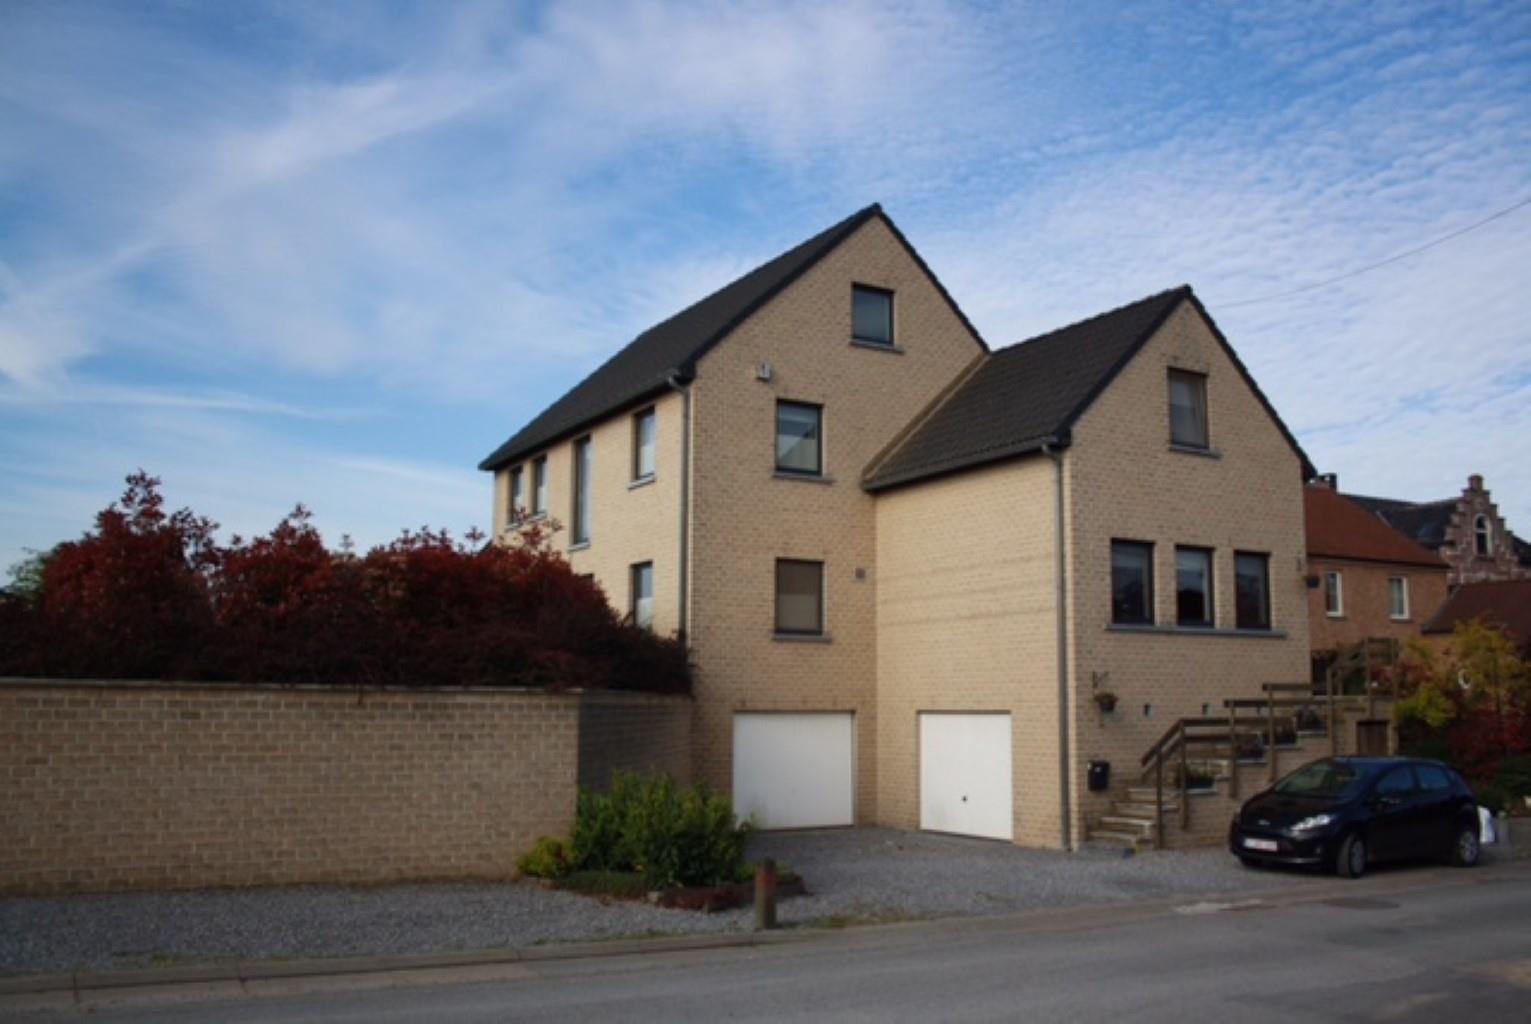 House - Villersla-Ville Tilly - #2038007-3